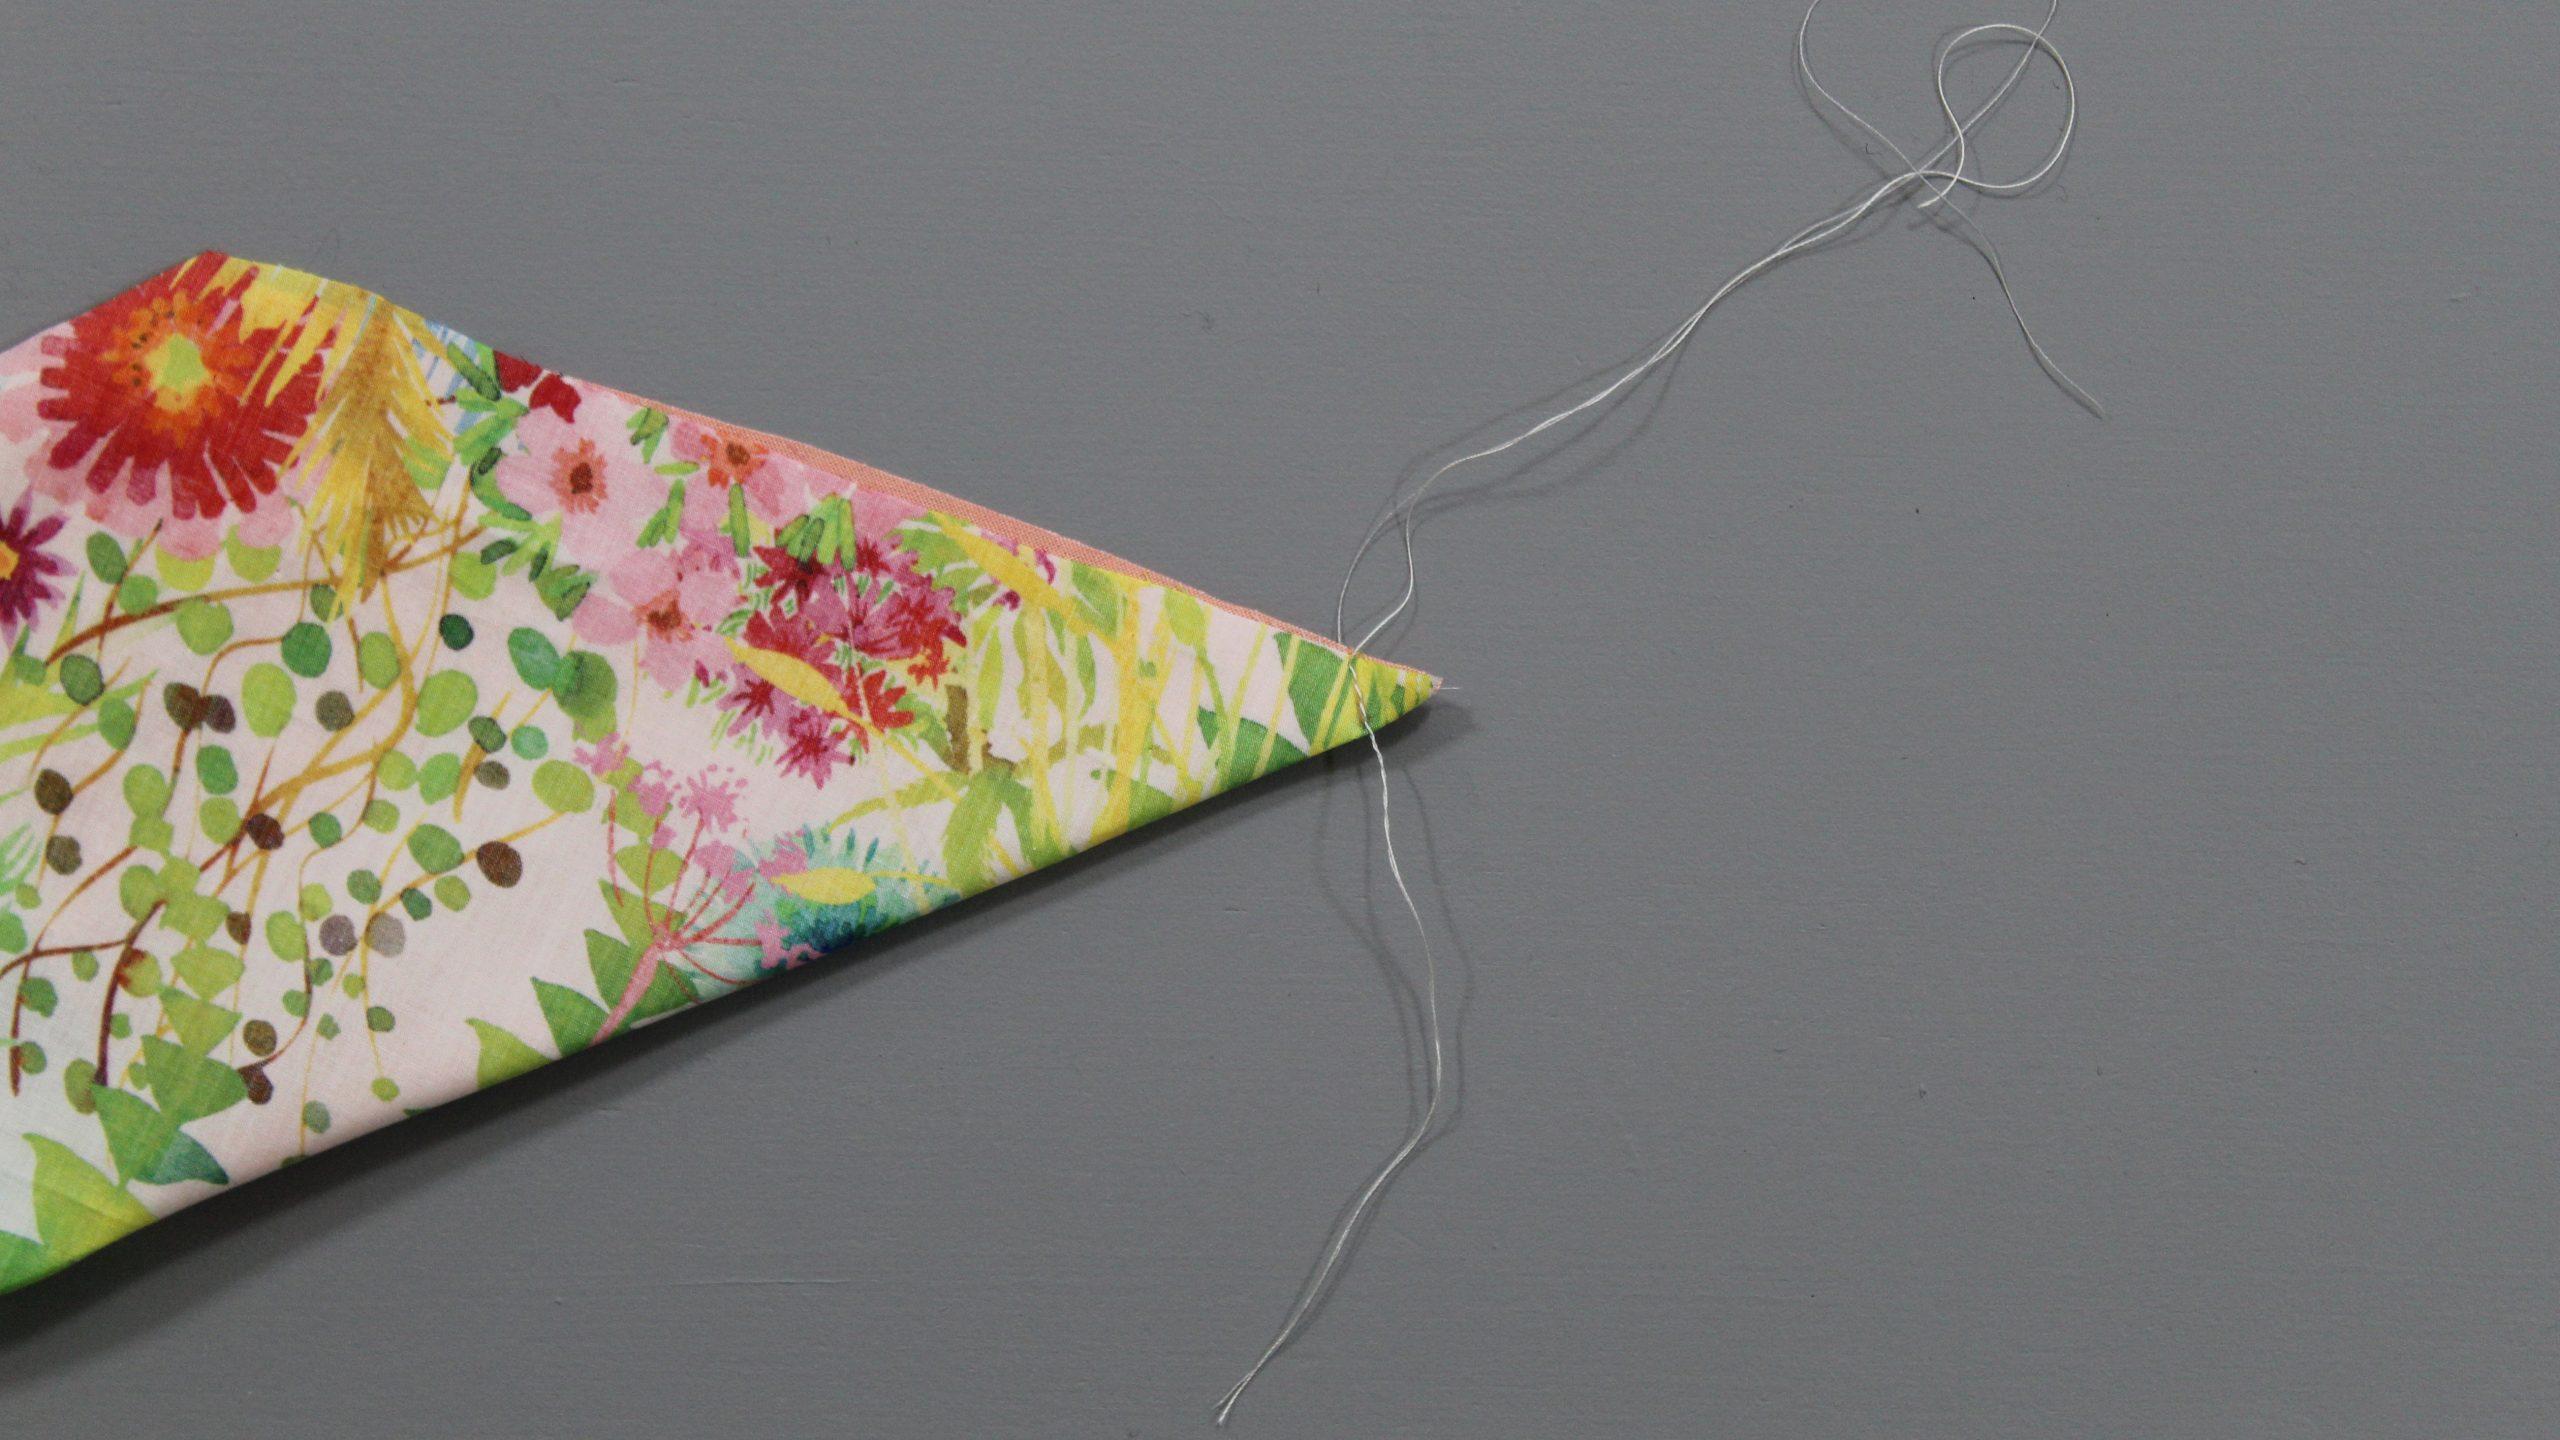 Stitch on tip of fabric